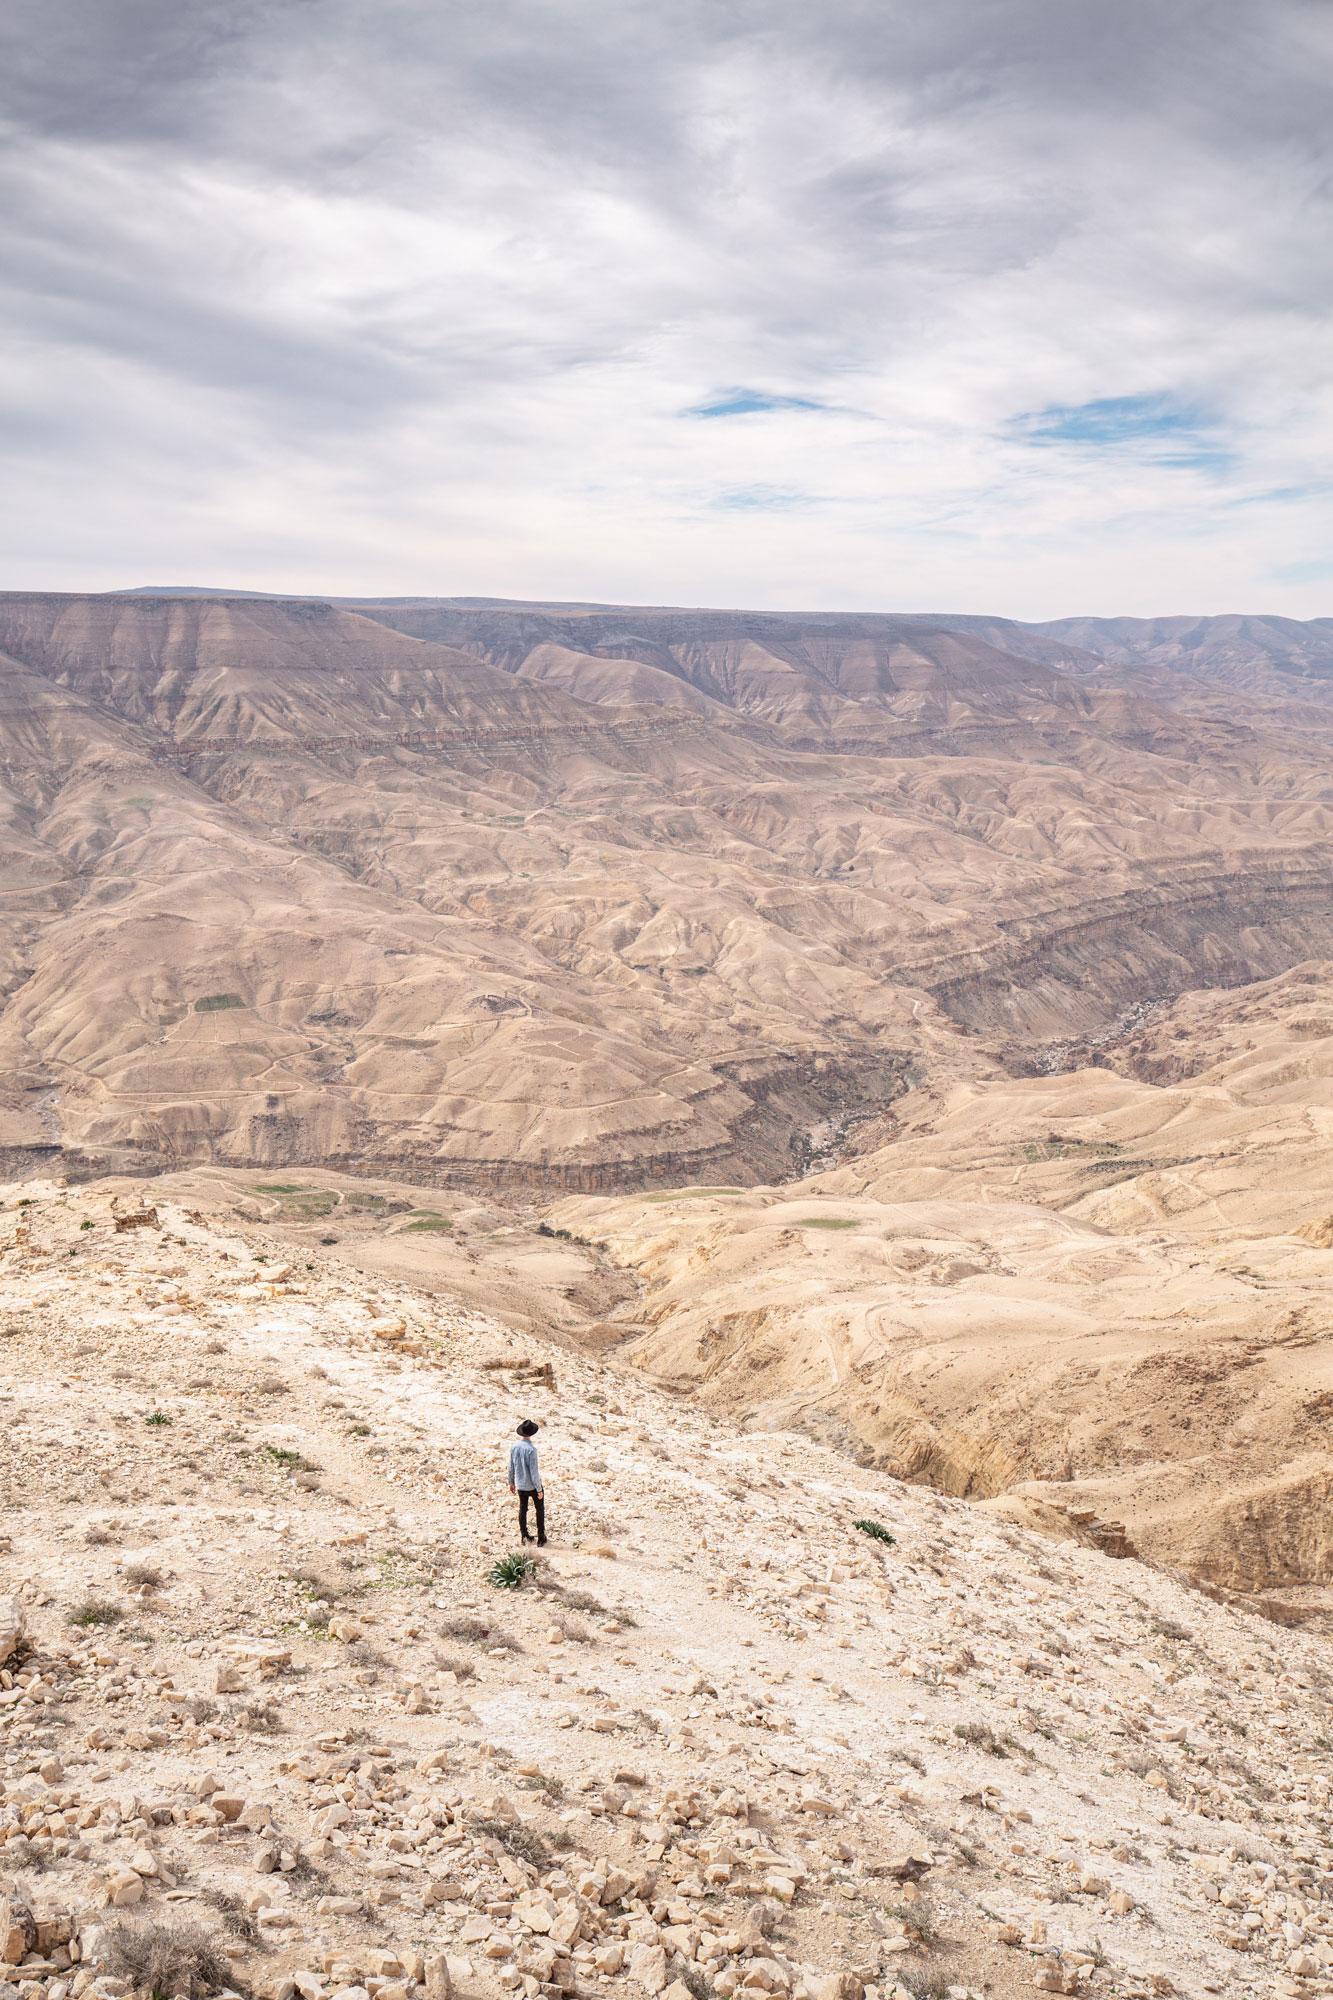 voyage en Jordanie Wadi Al-Mujib